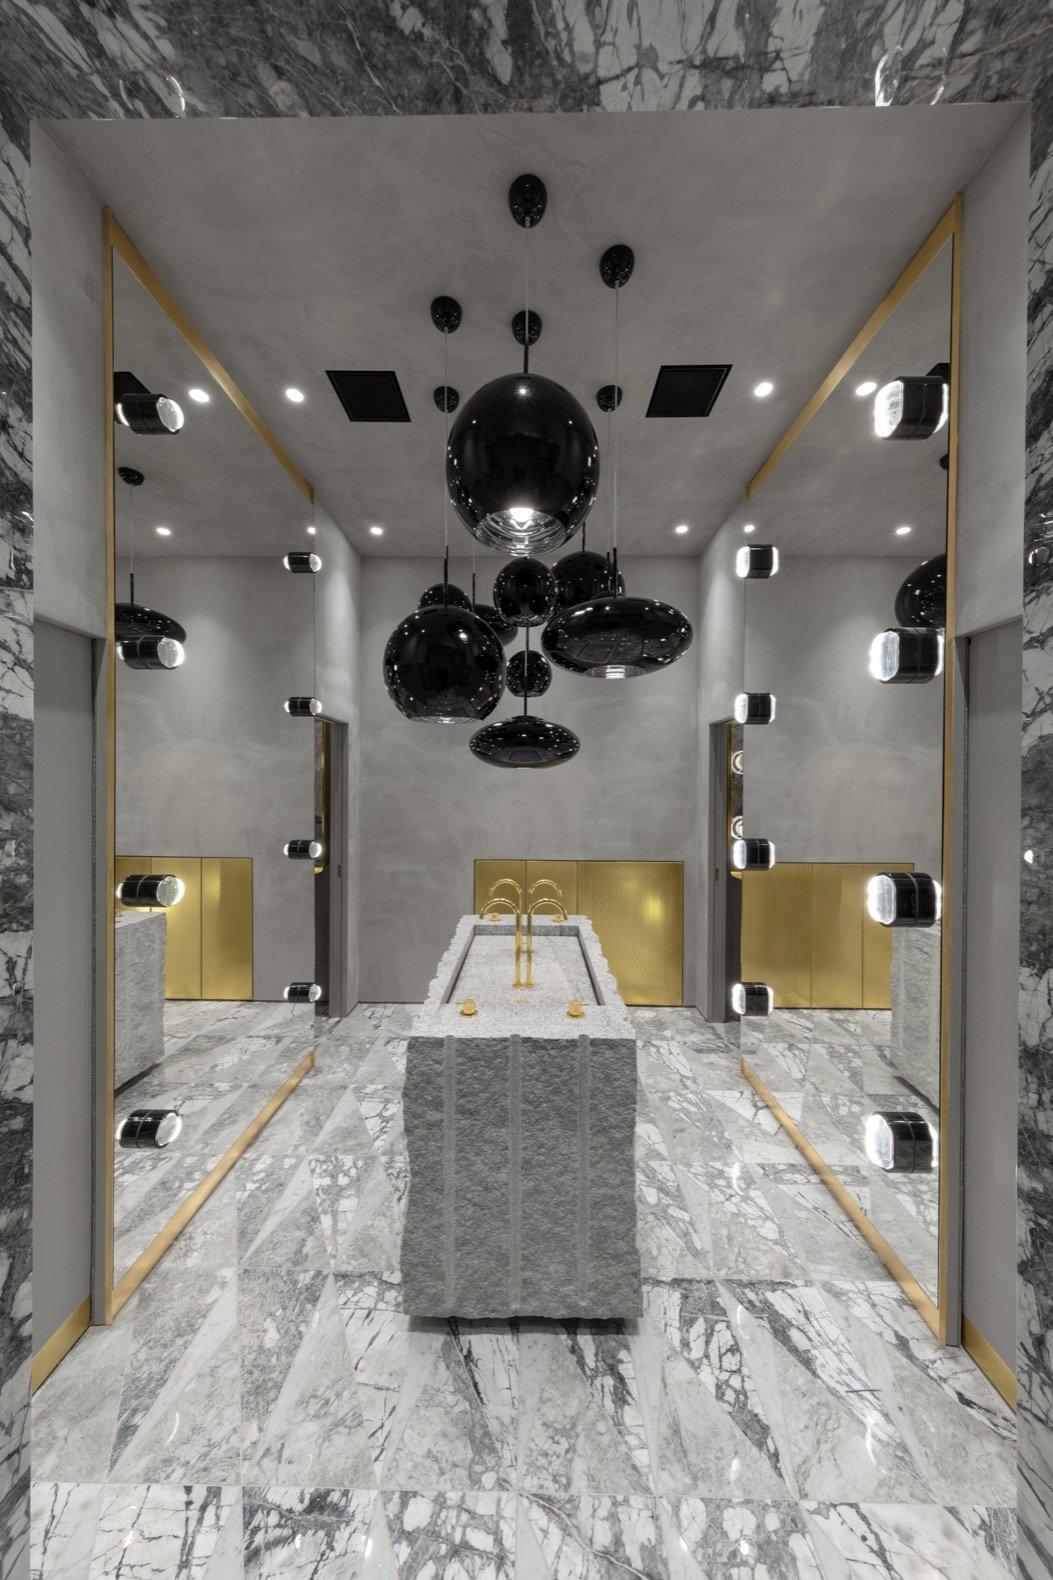 The Manzoni bathroom